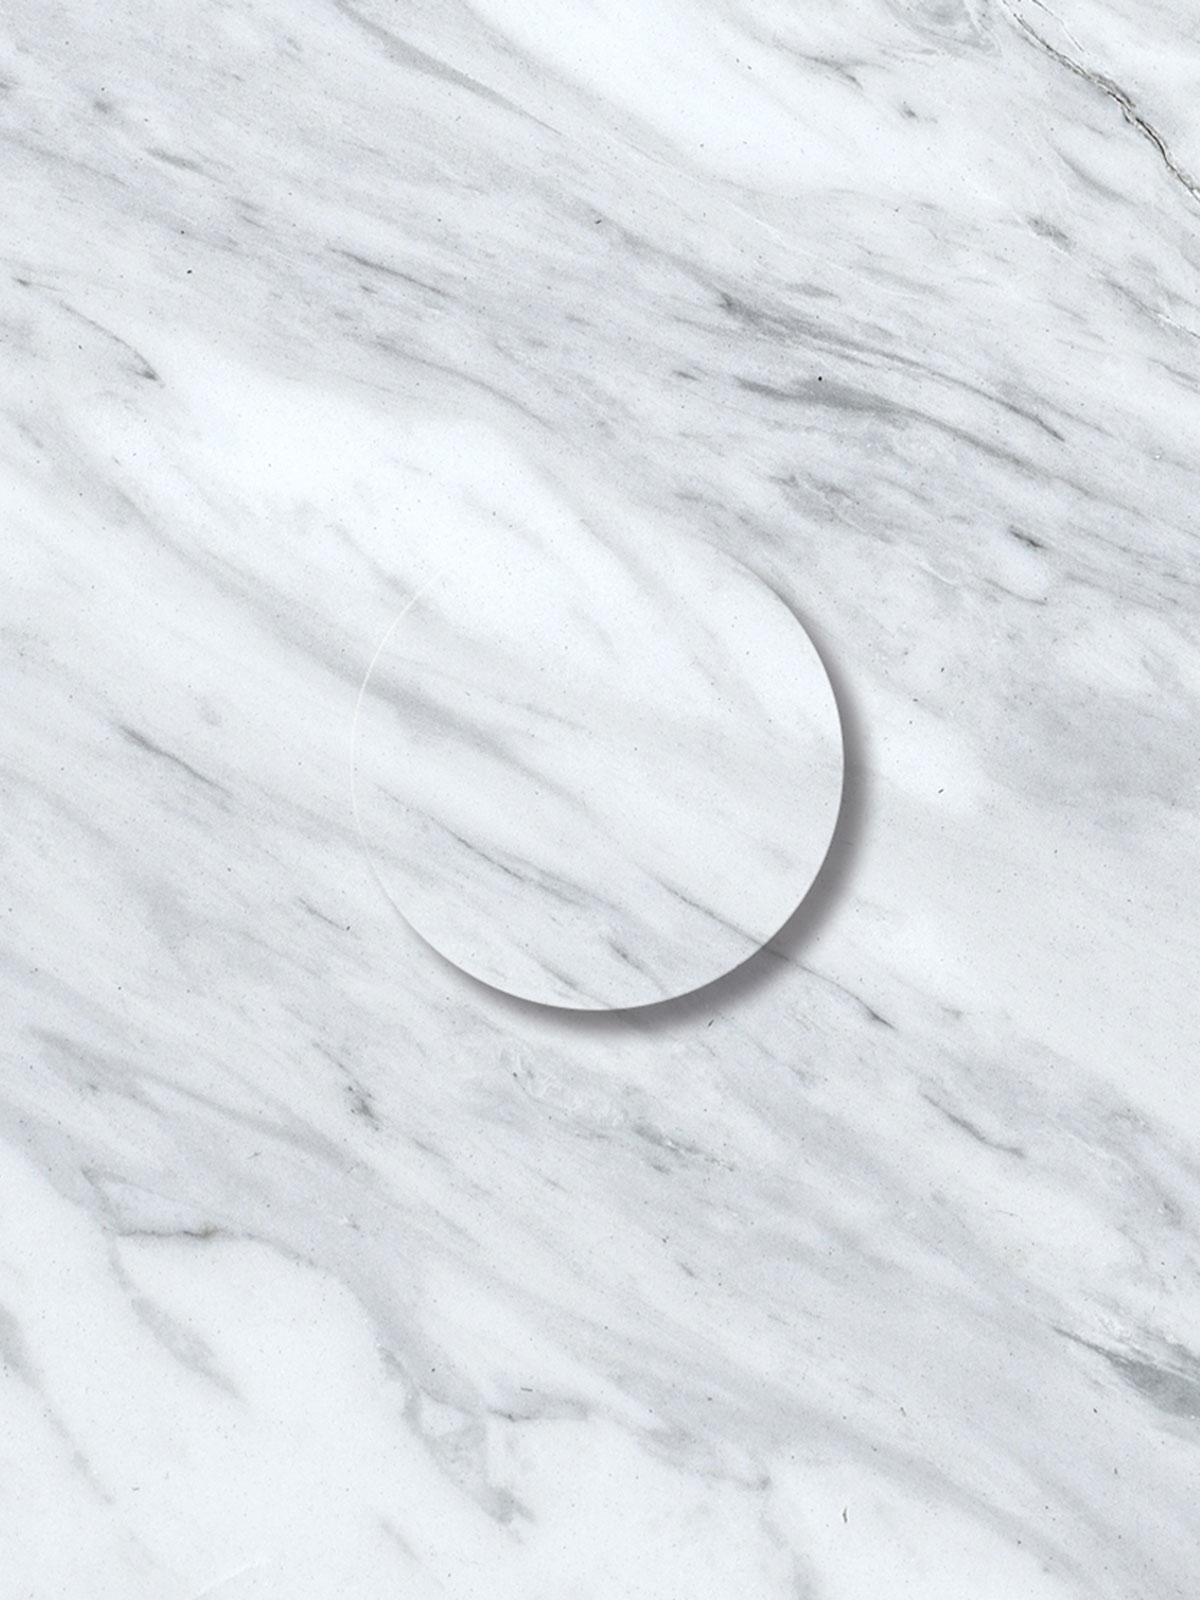 sensor, remote sensor, marble